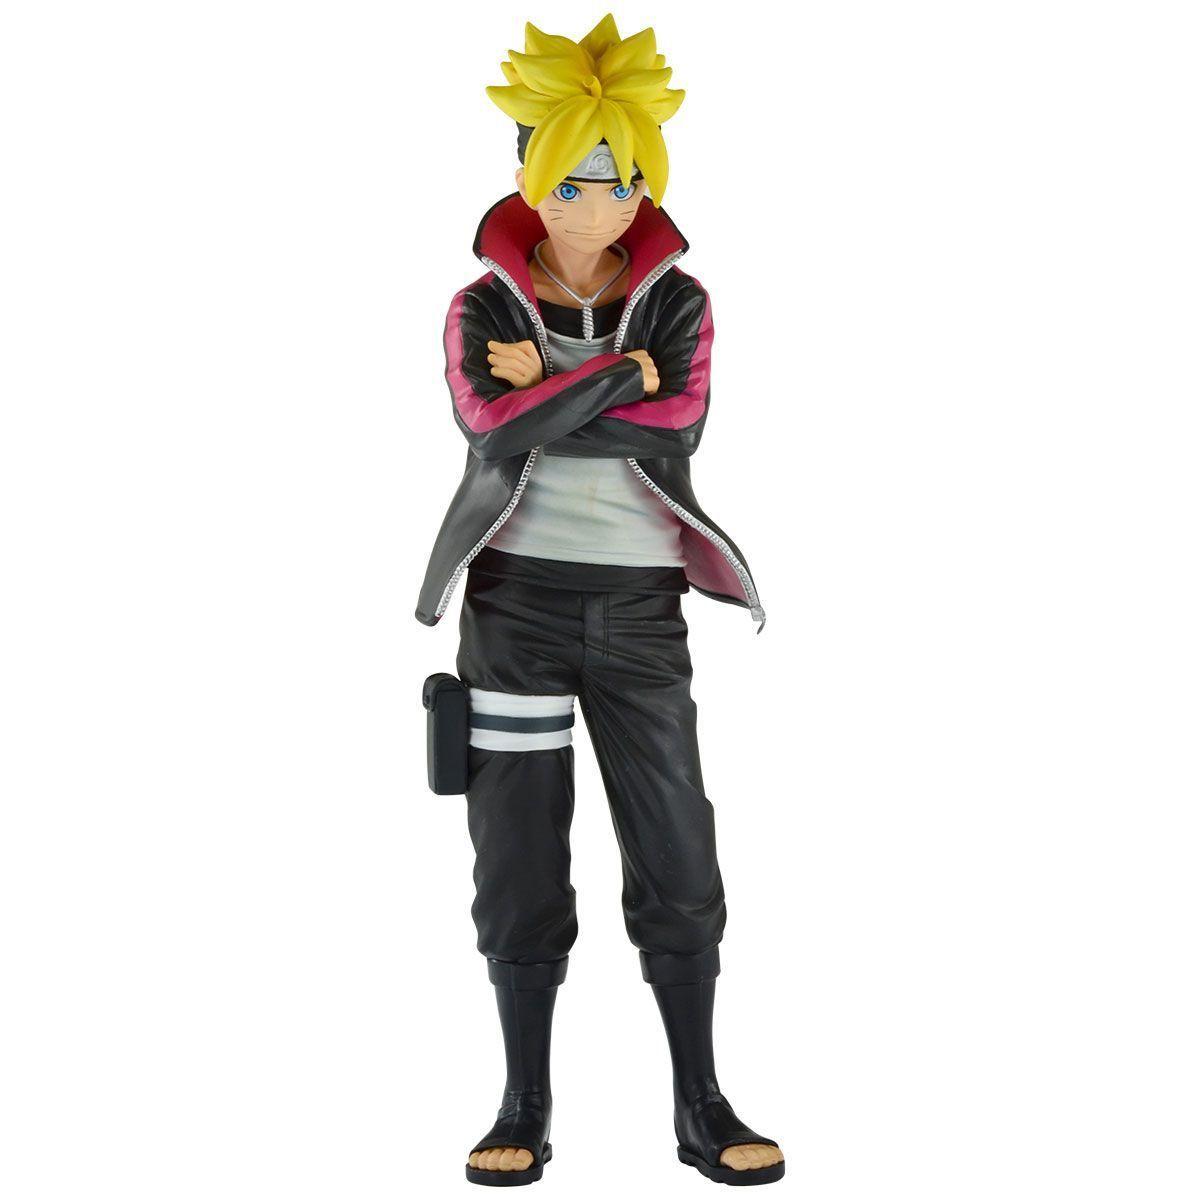 Action Figure Boruto Uzumaki: Naruto Next Generation (Grandista) Boneco Colecionável - Banpresto